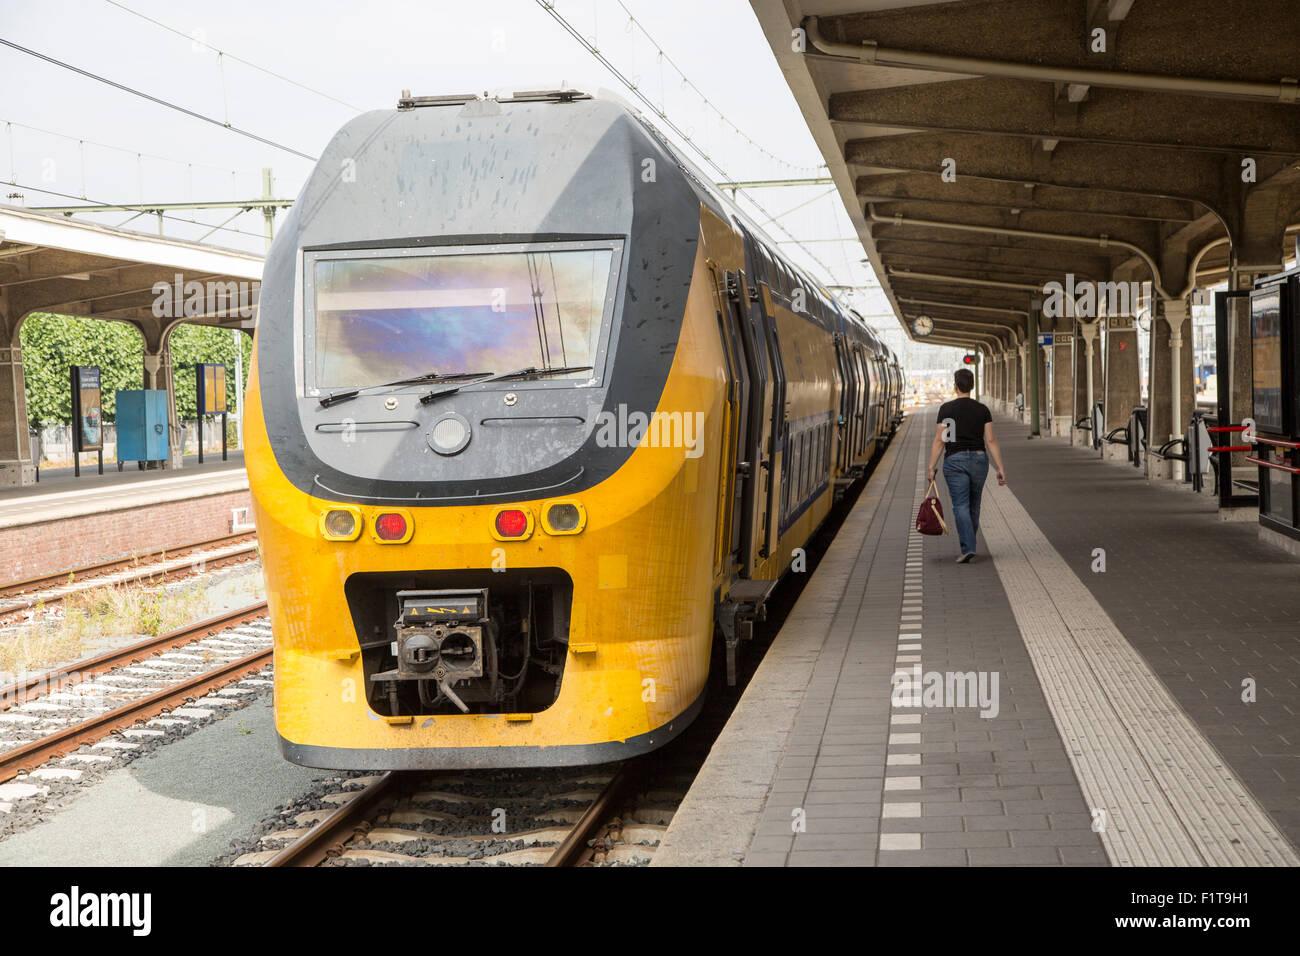 Sprinter train at platform, Maastricht railway station, Limburg province, Netherlands - Stock Image